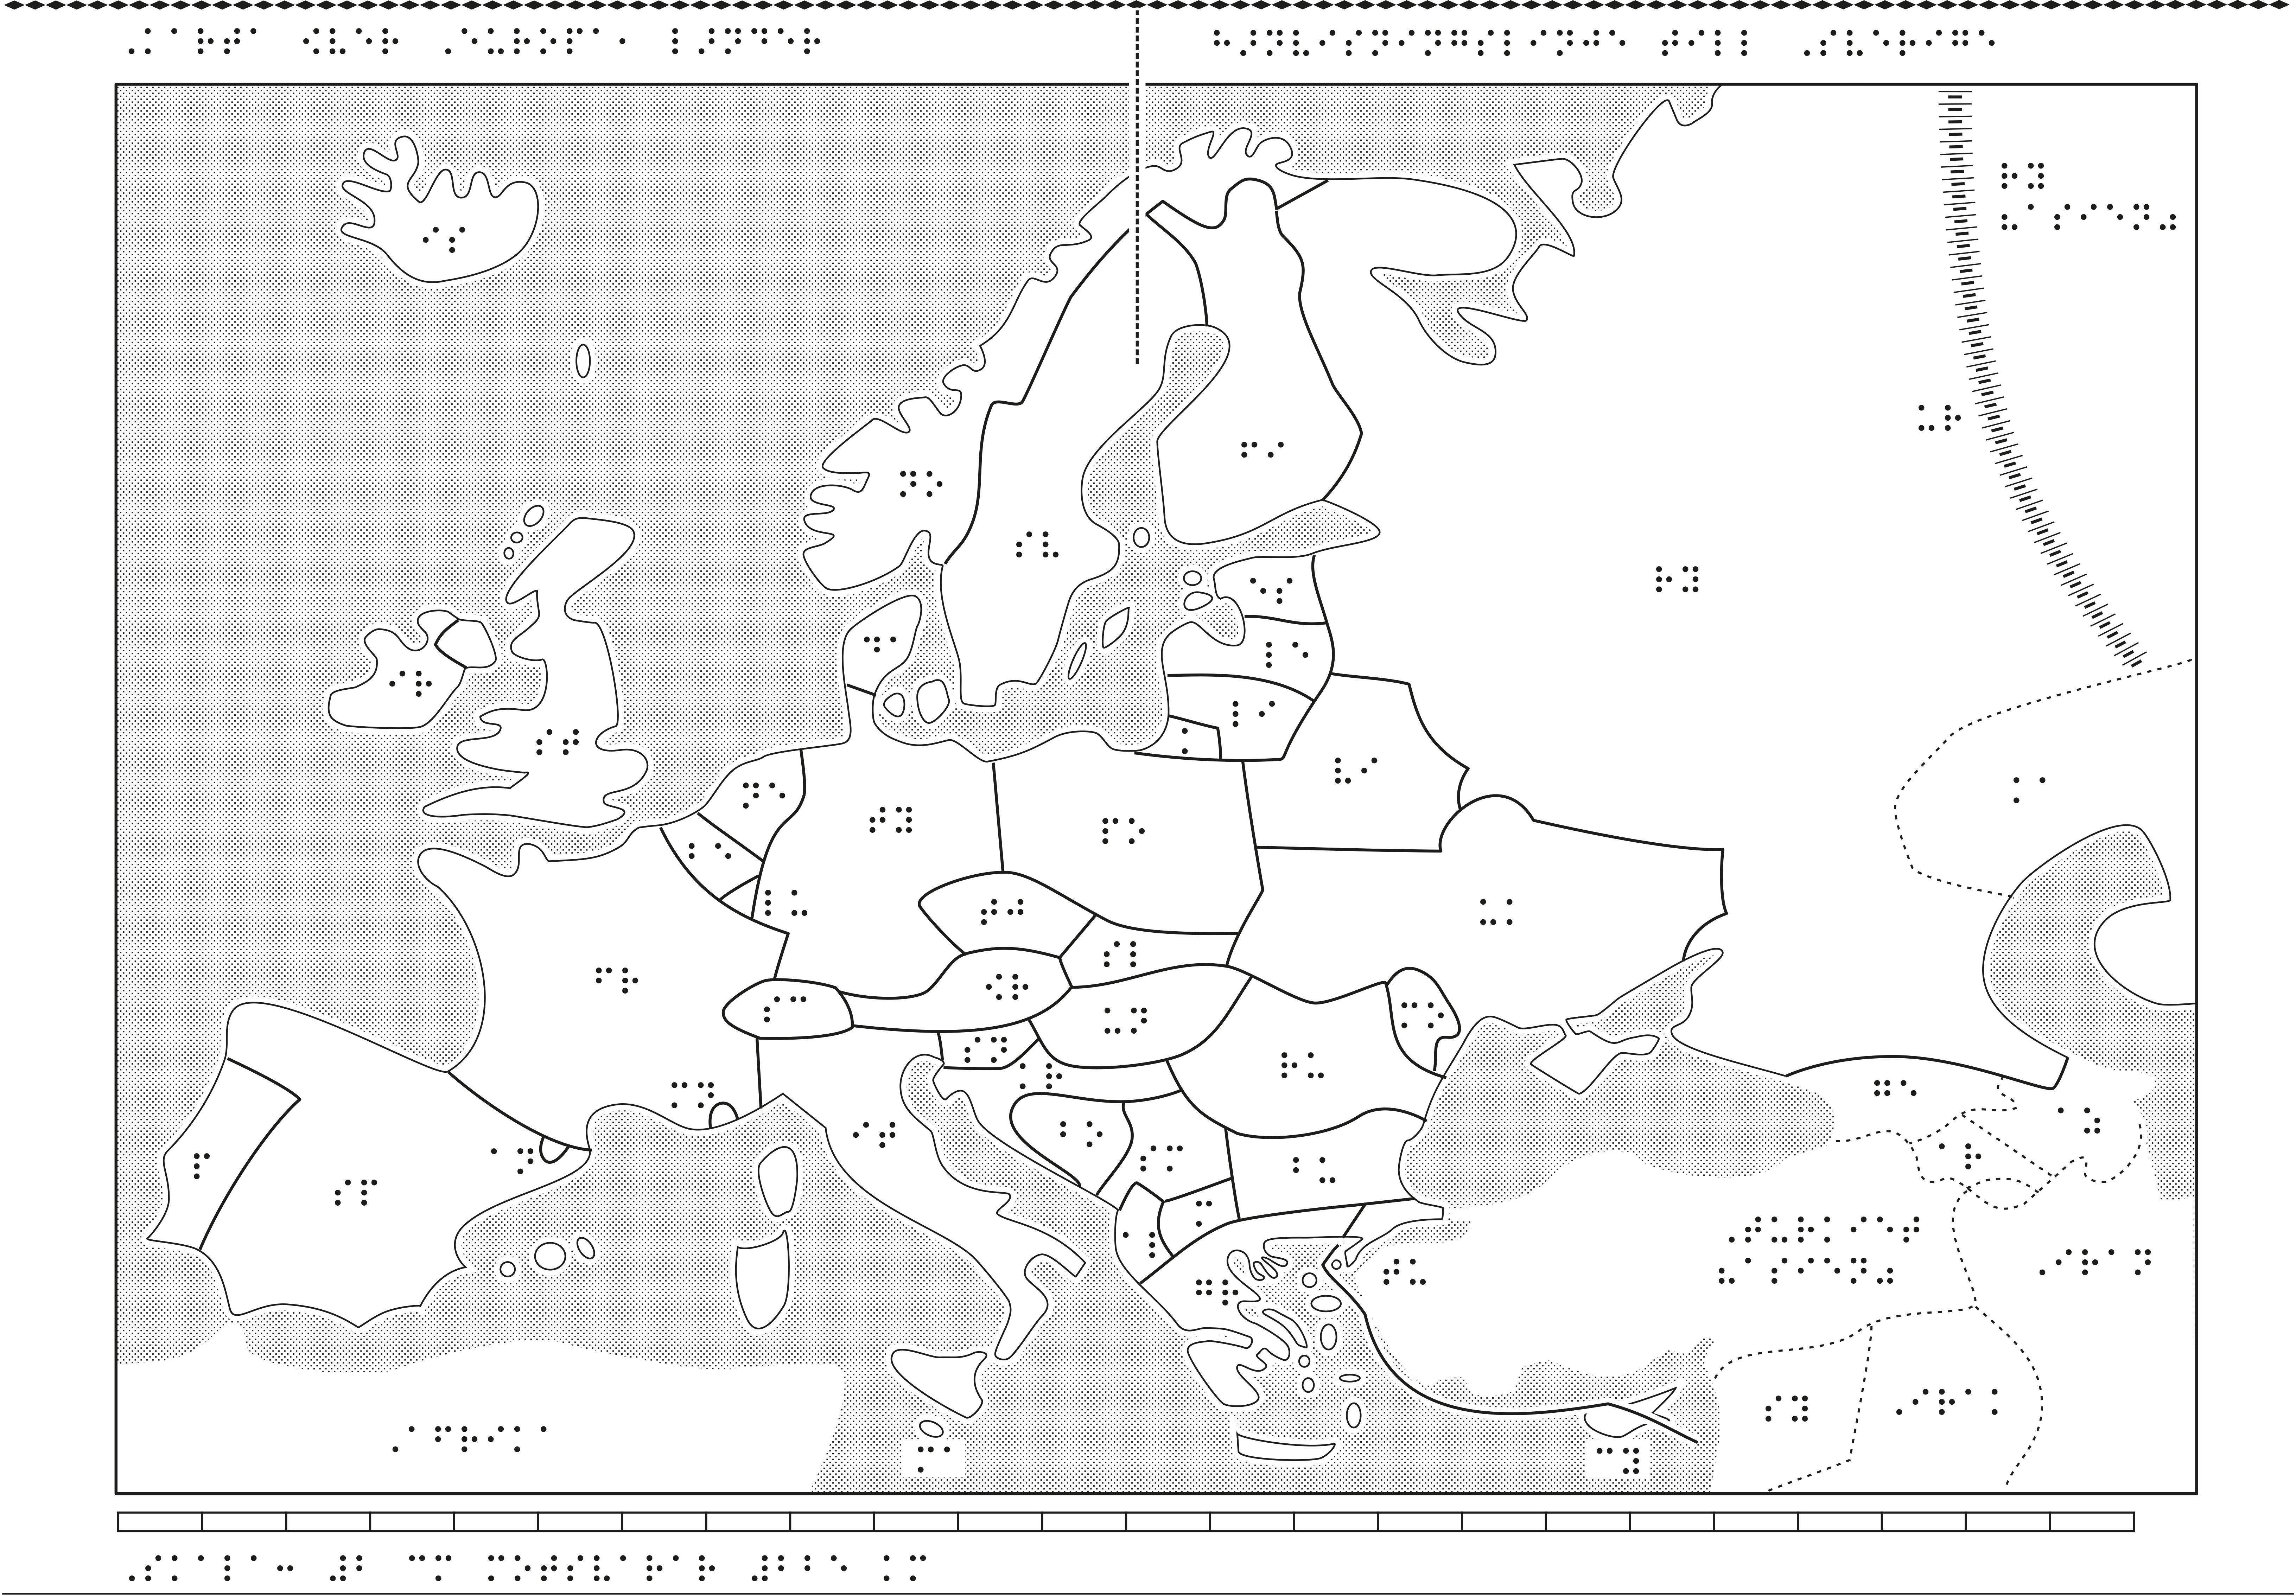 Europakarta i relief.